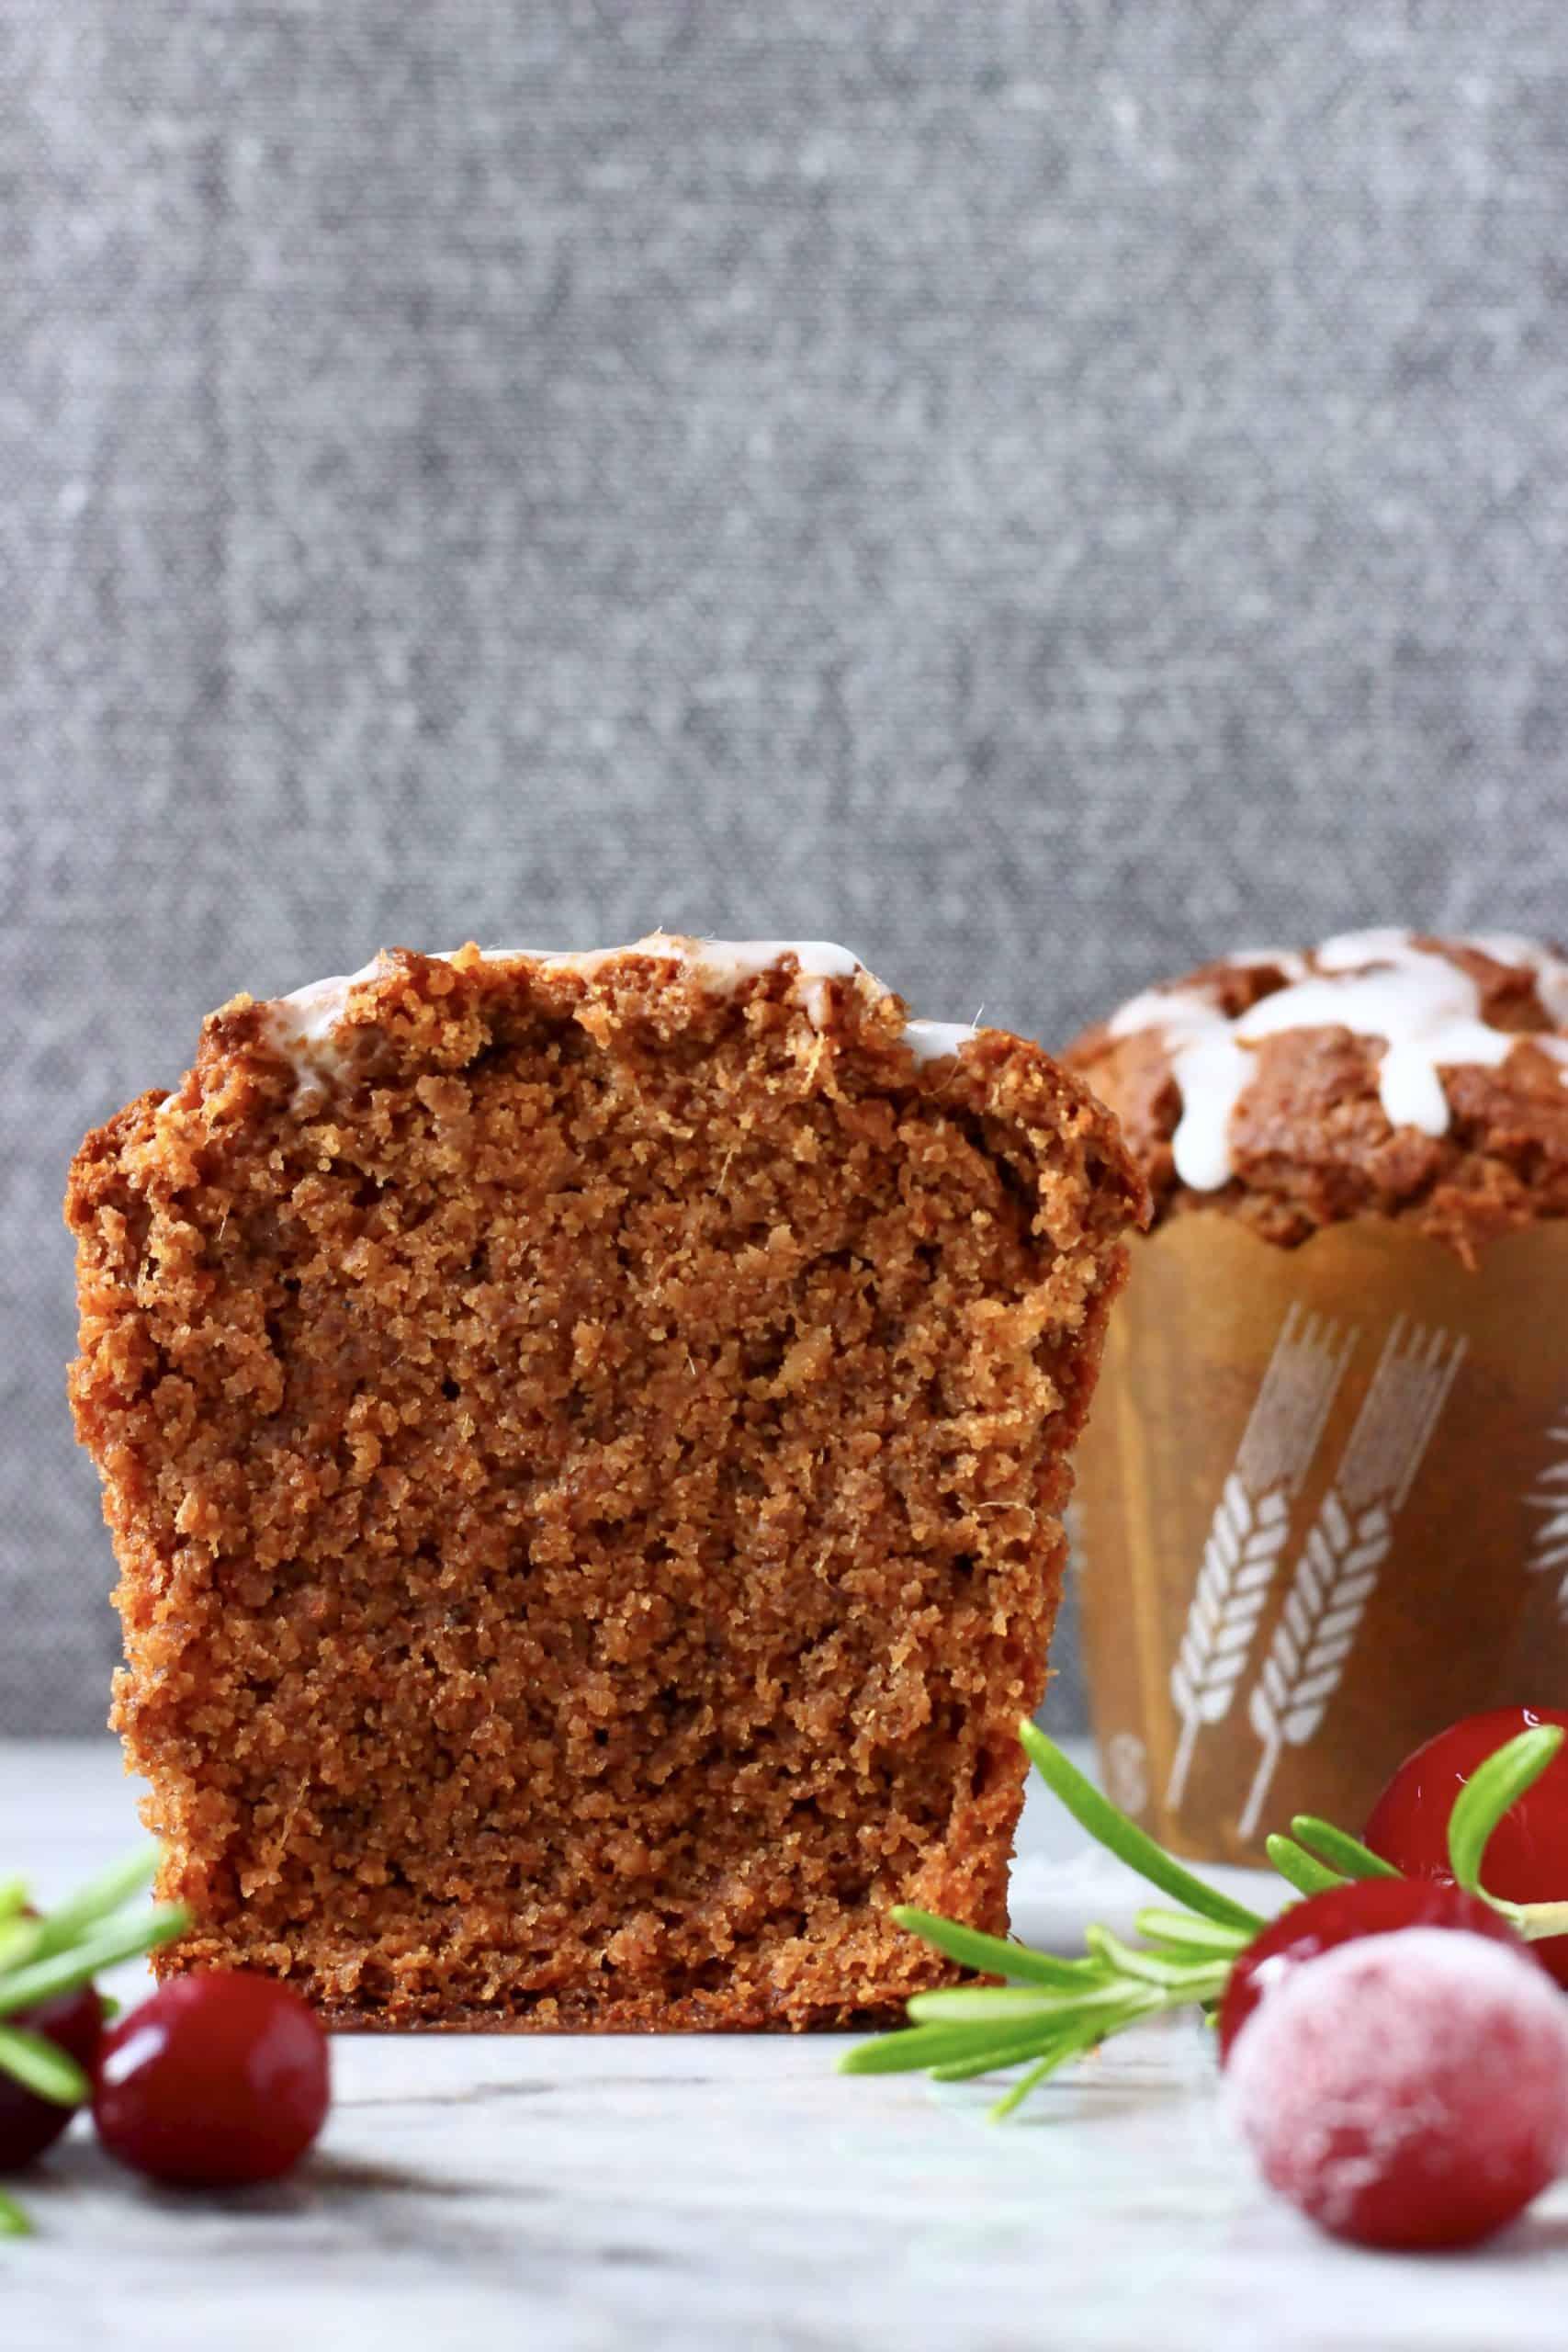 Two gluten-free vegan gingerbread muffins, one sliced in half